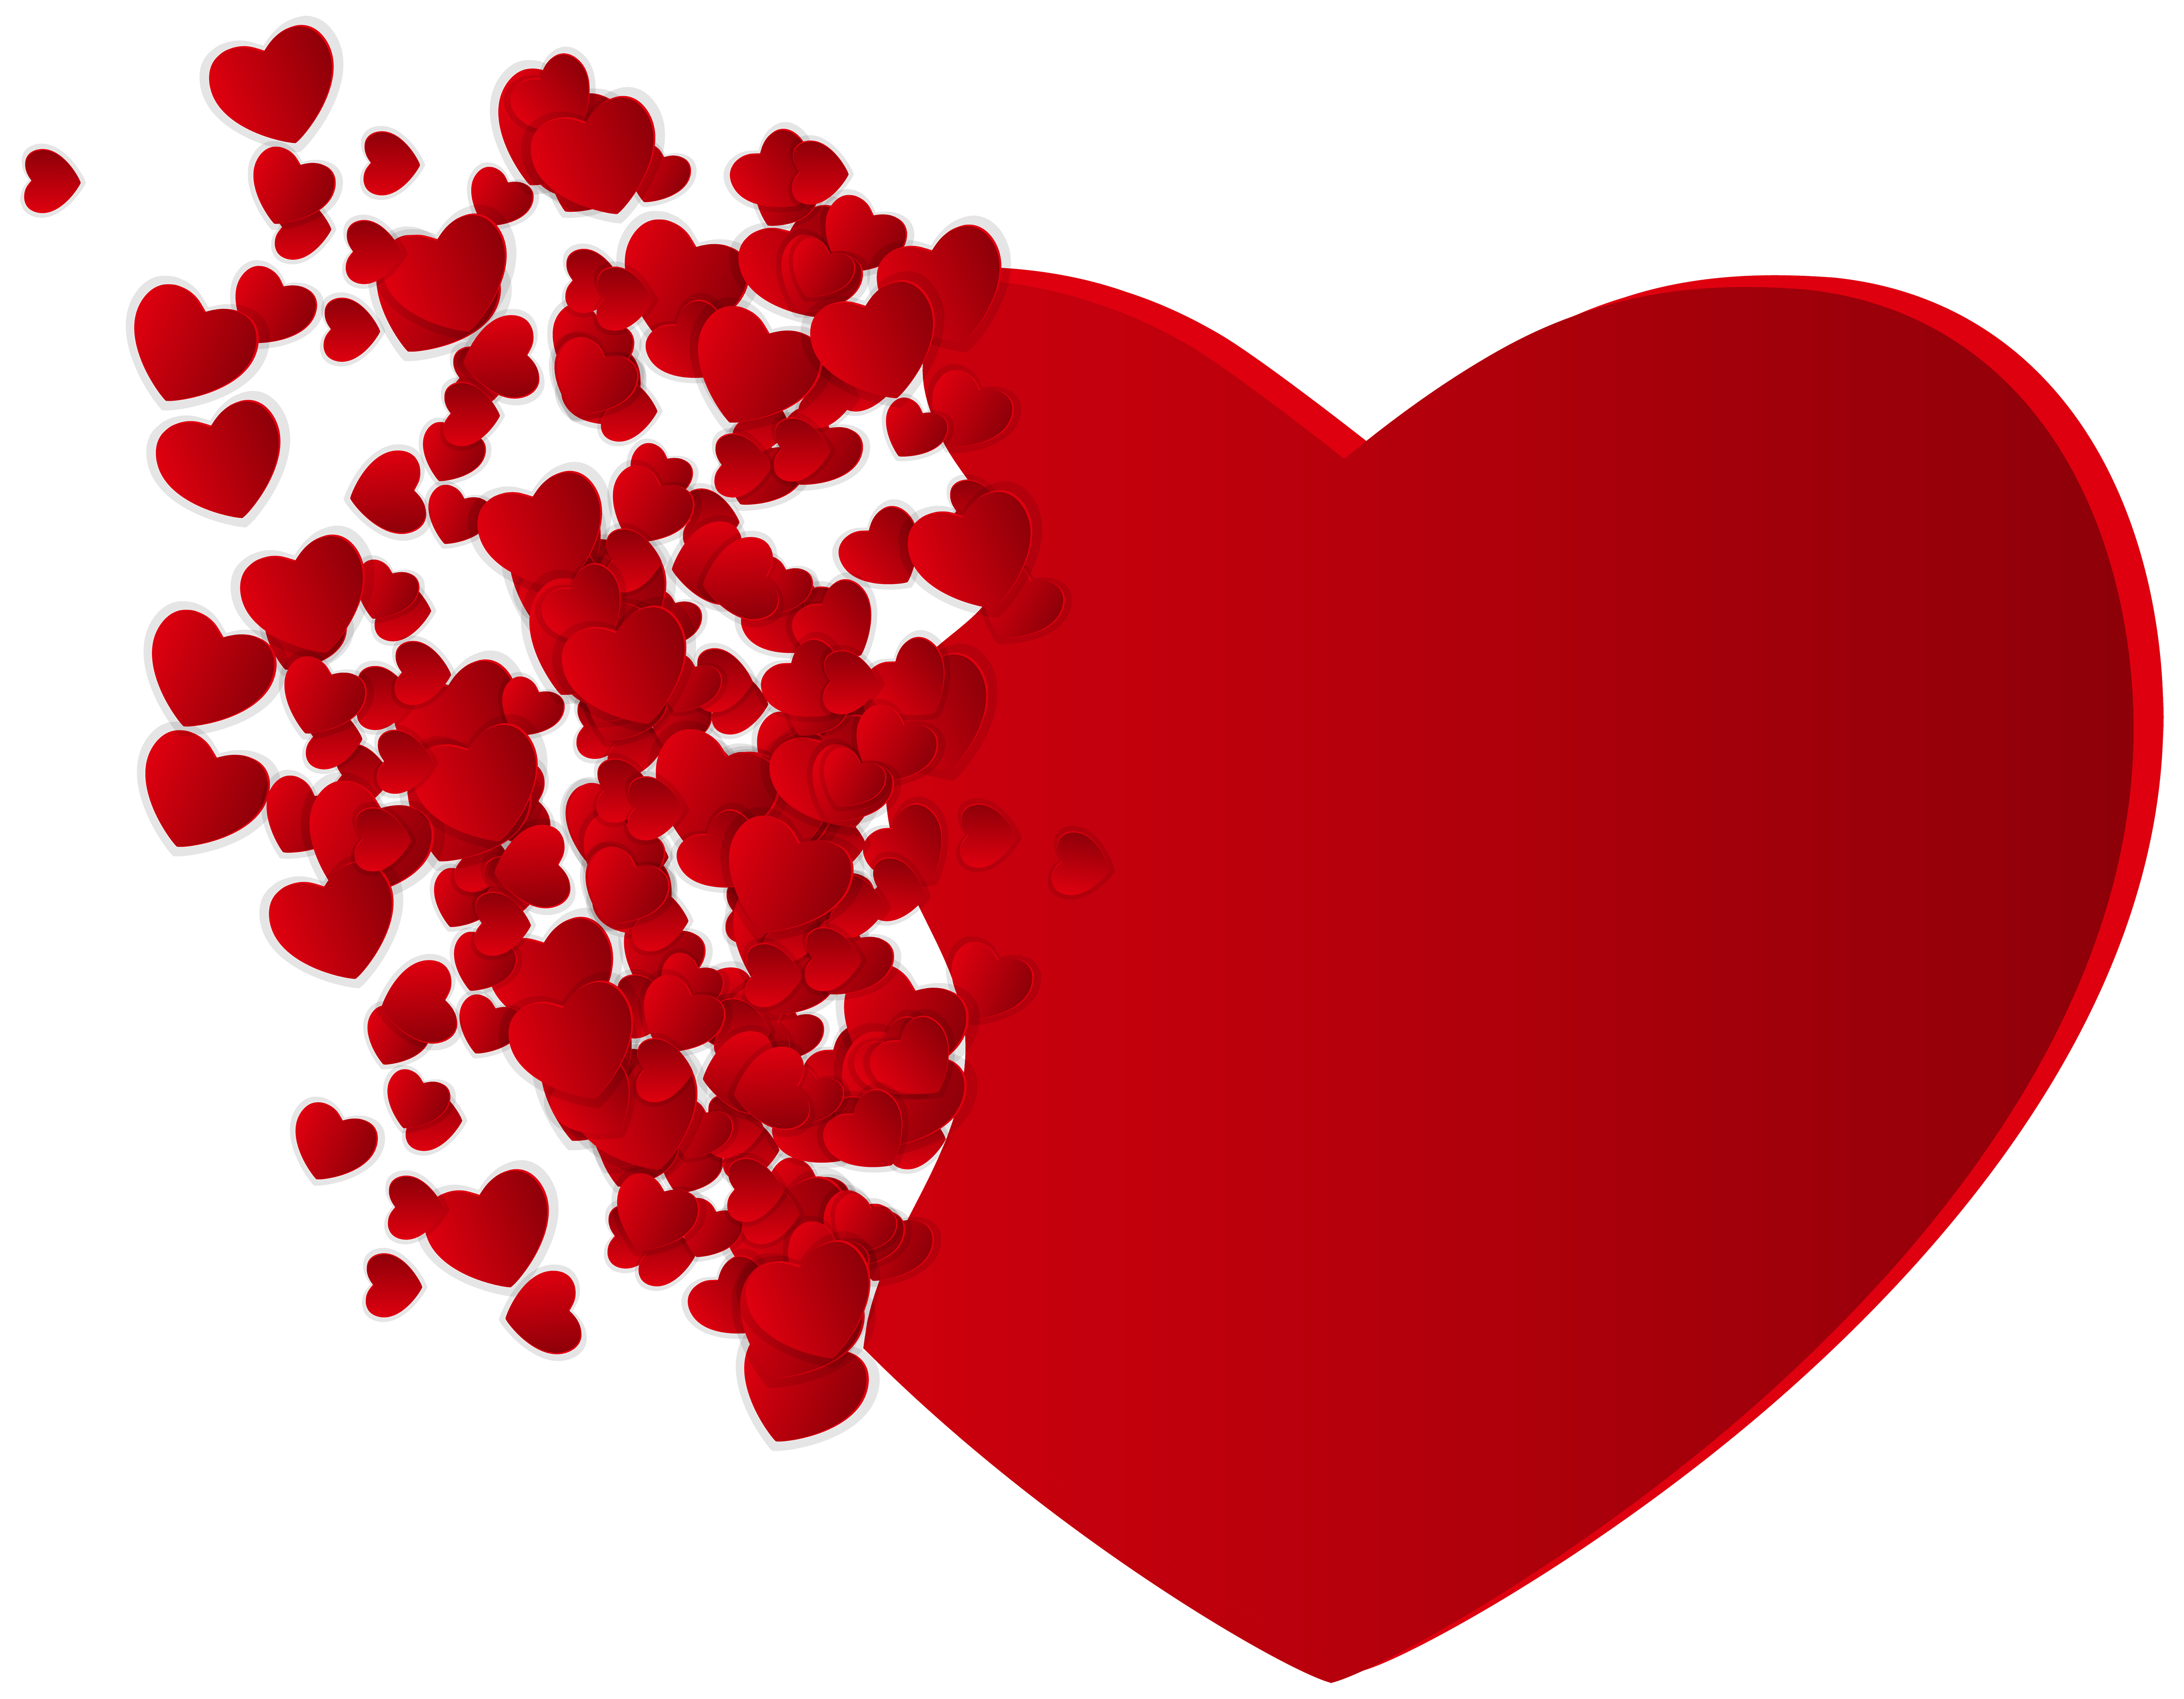 Hearts Png Hearts Png Hd Transparent Hearts Hd Png Images